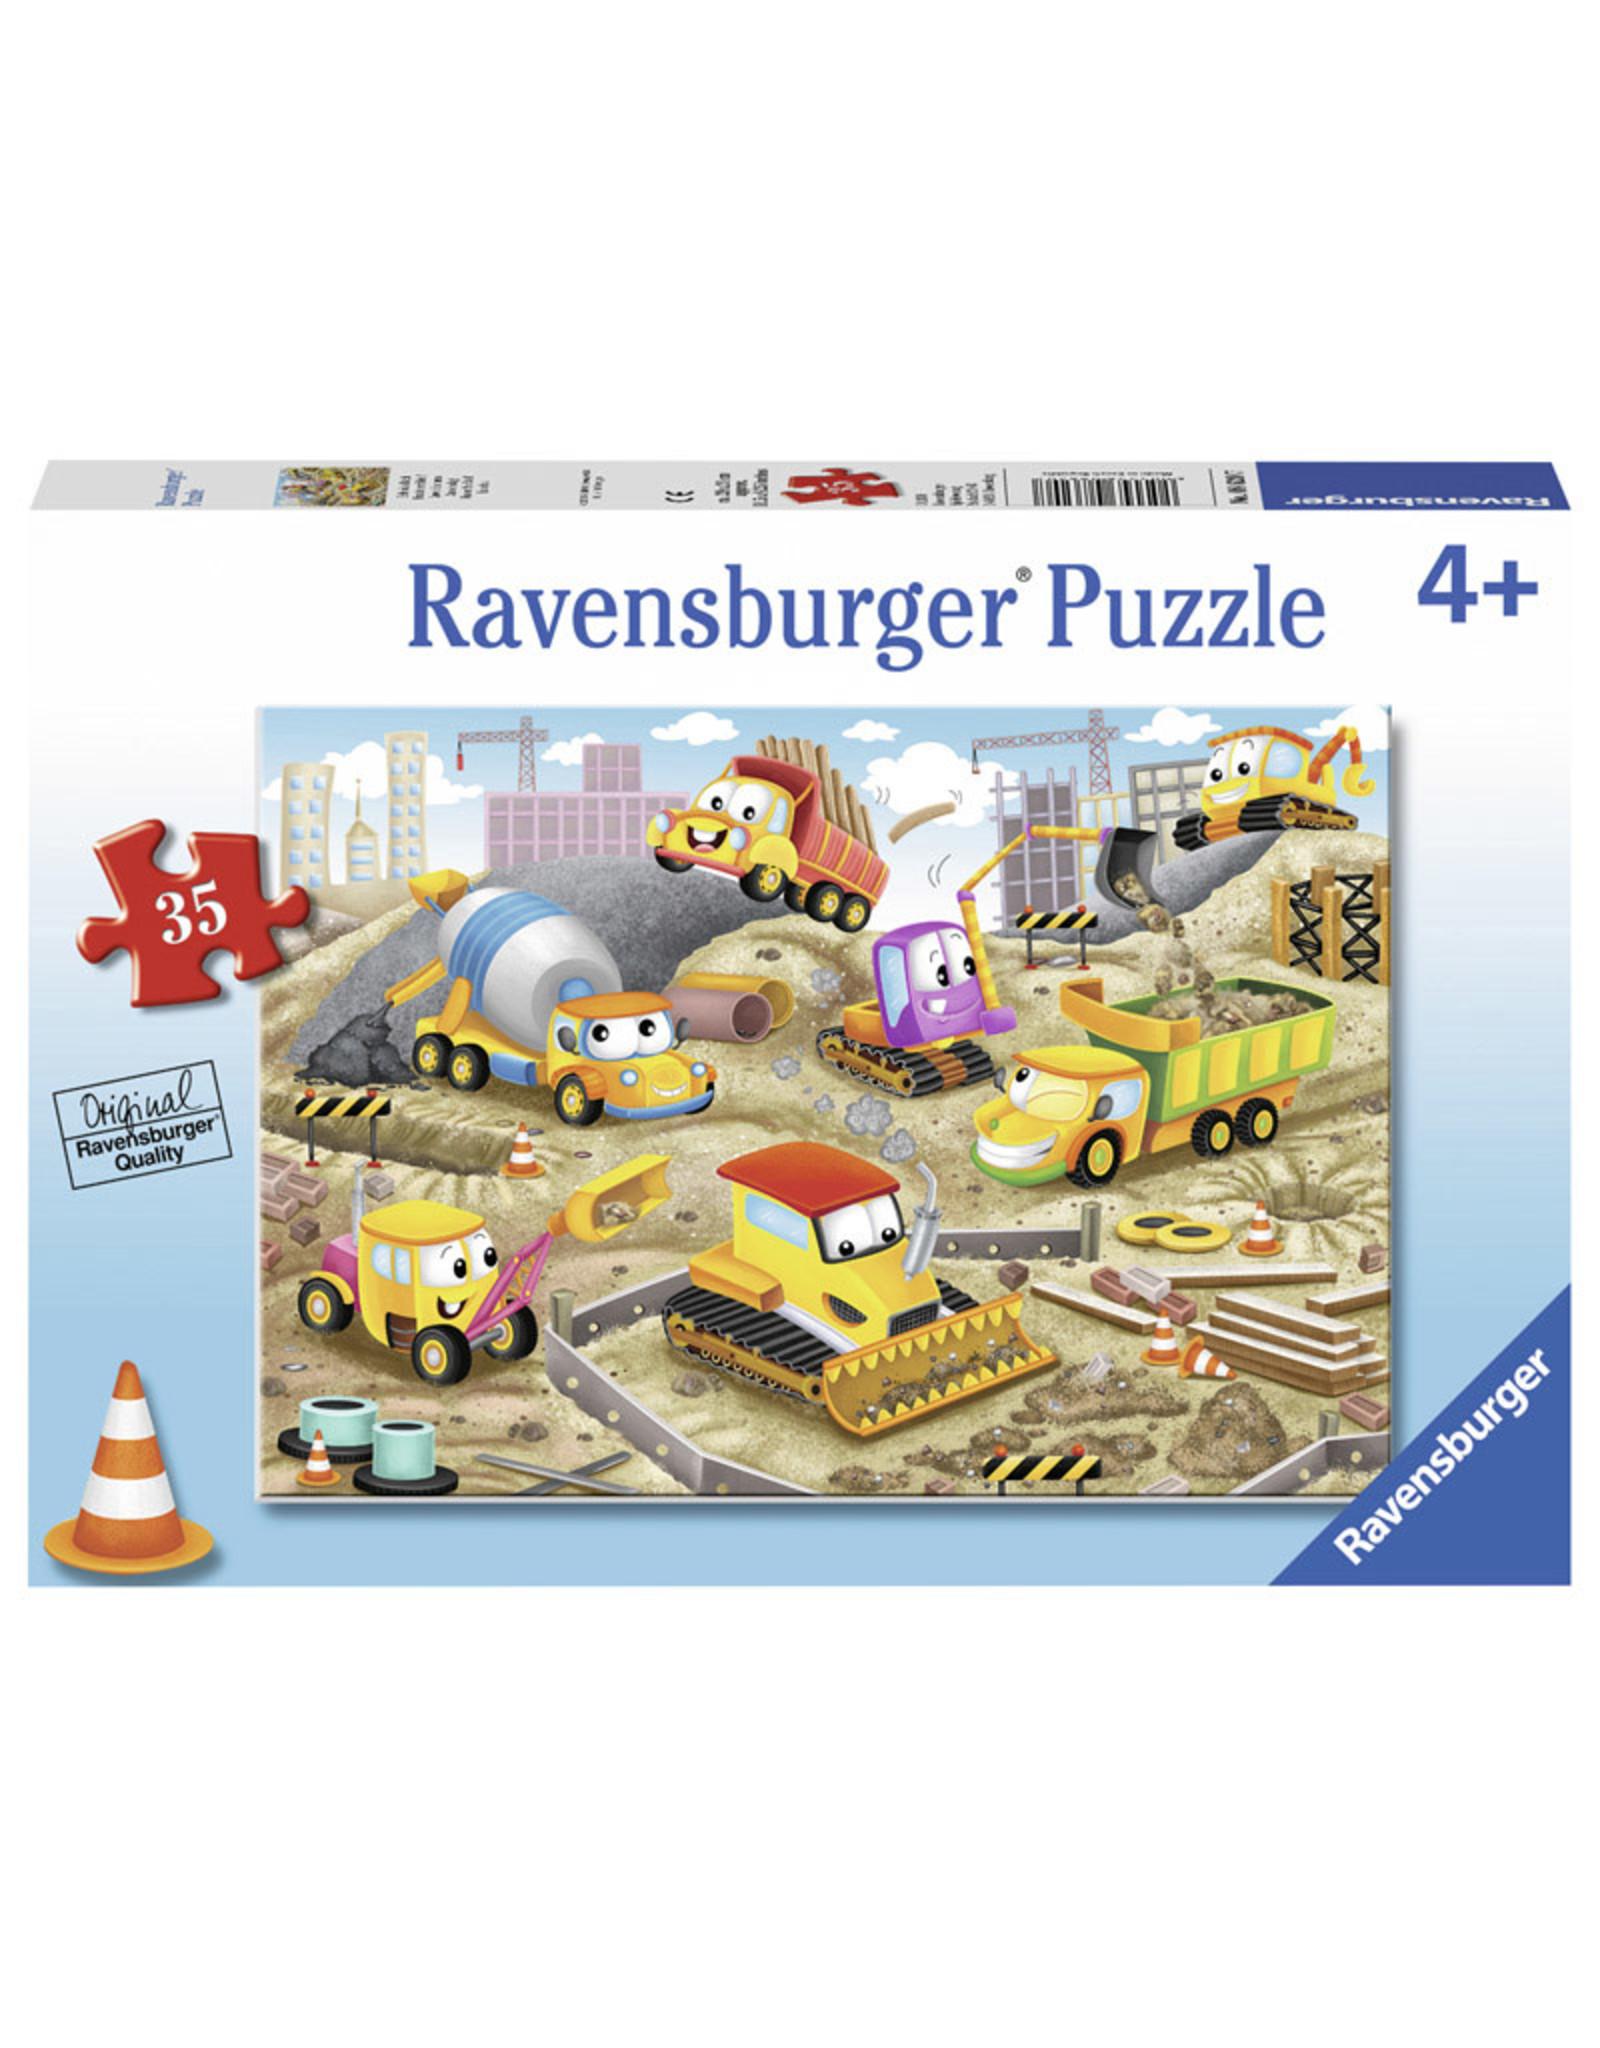 Ravensburger Raise the Roof 35pc